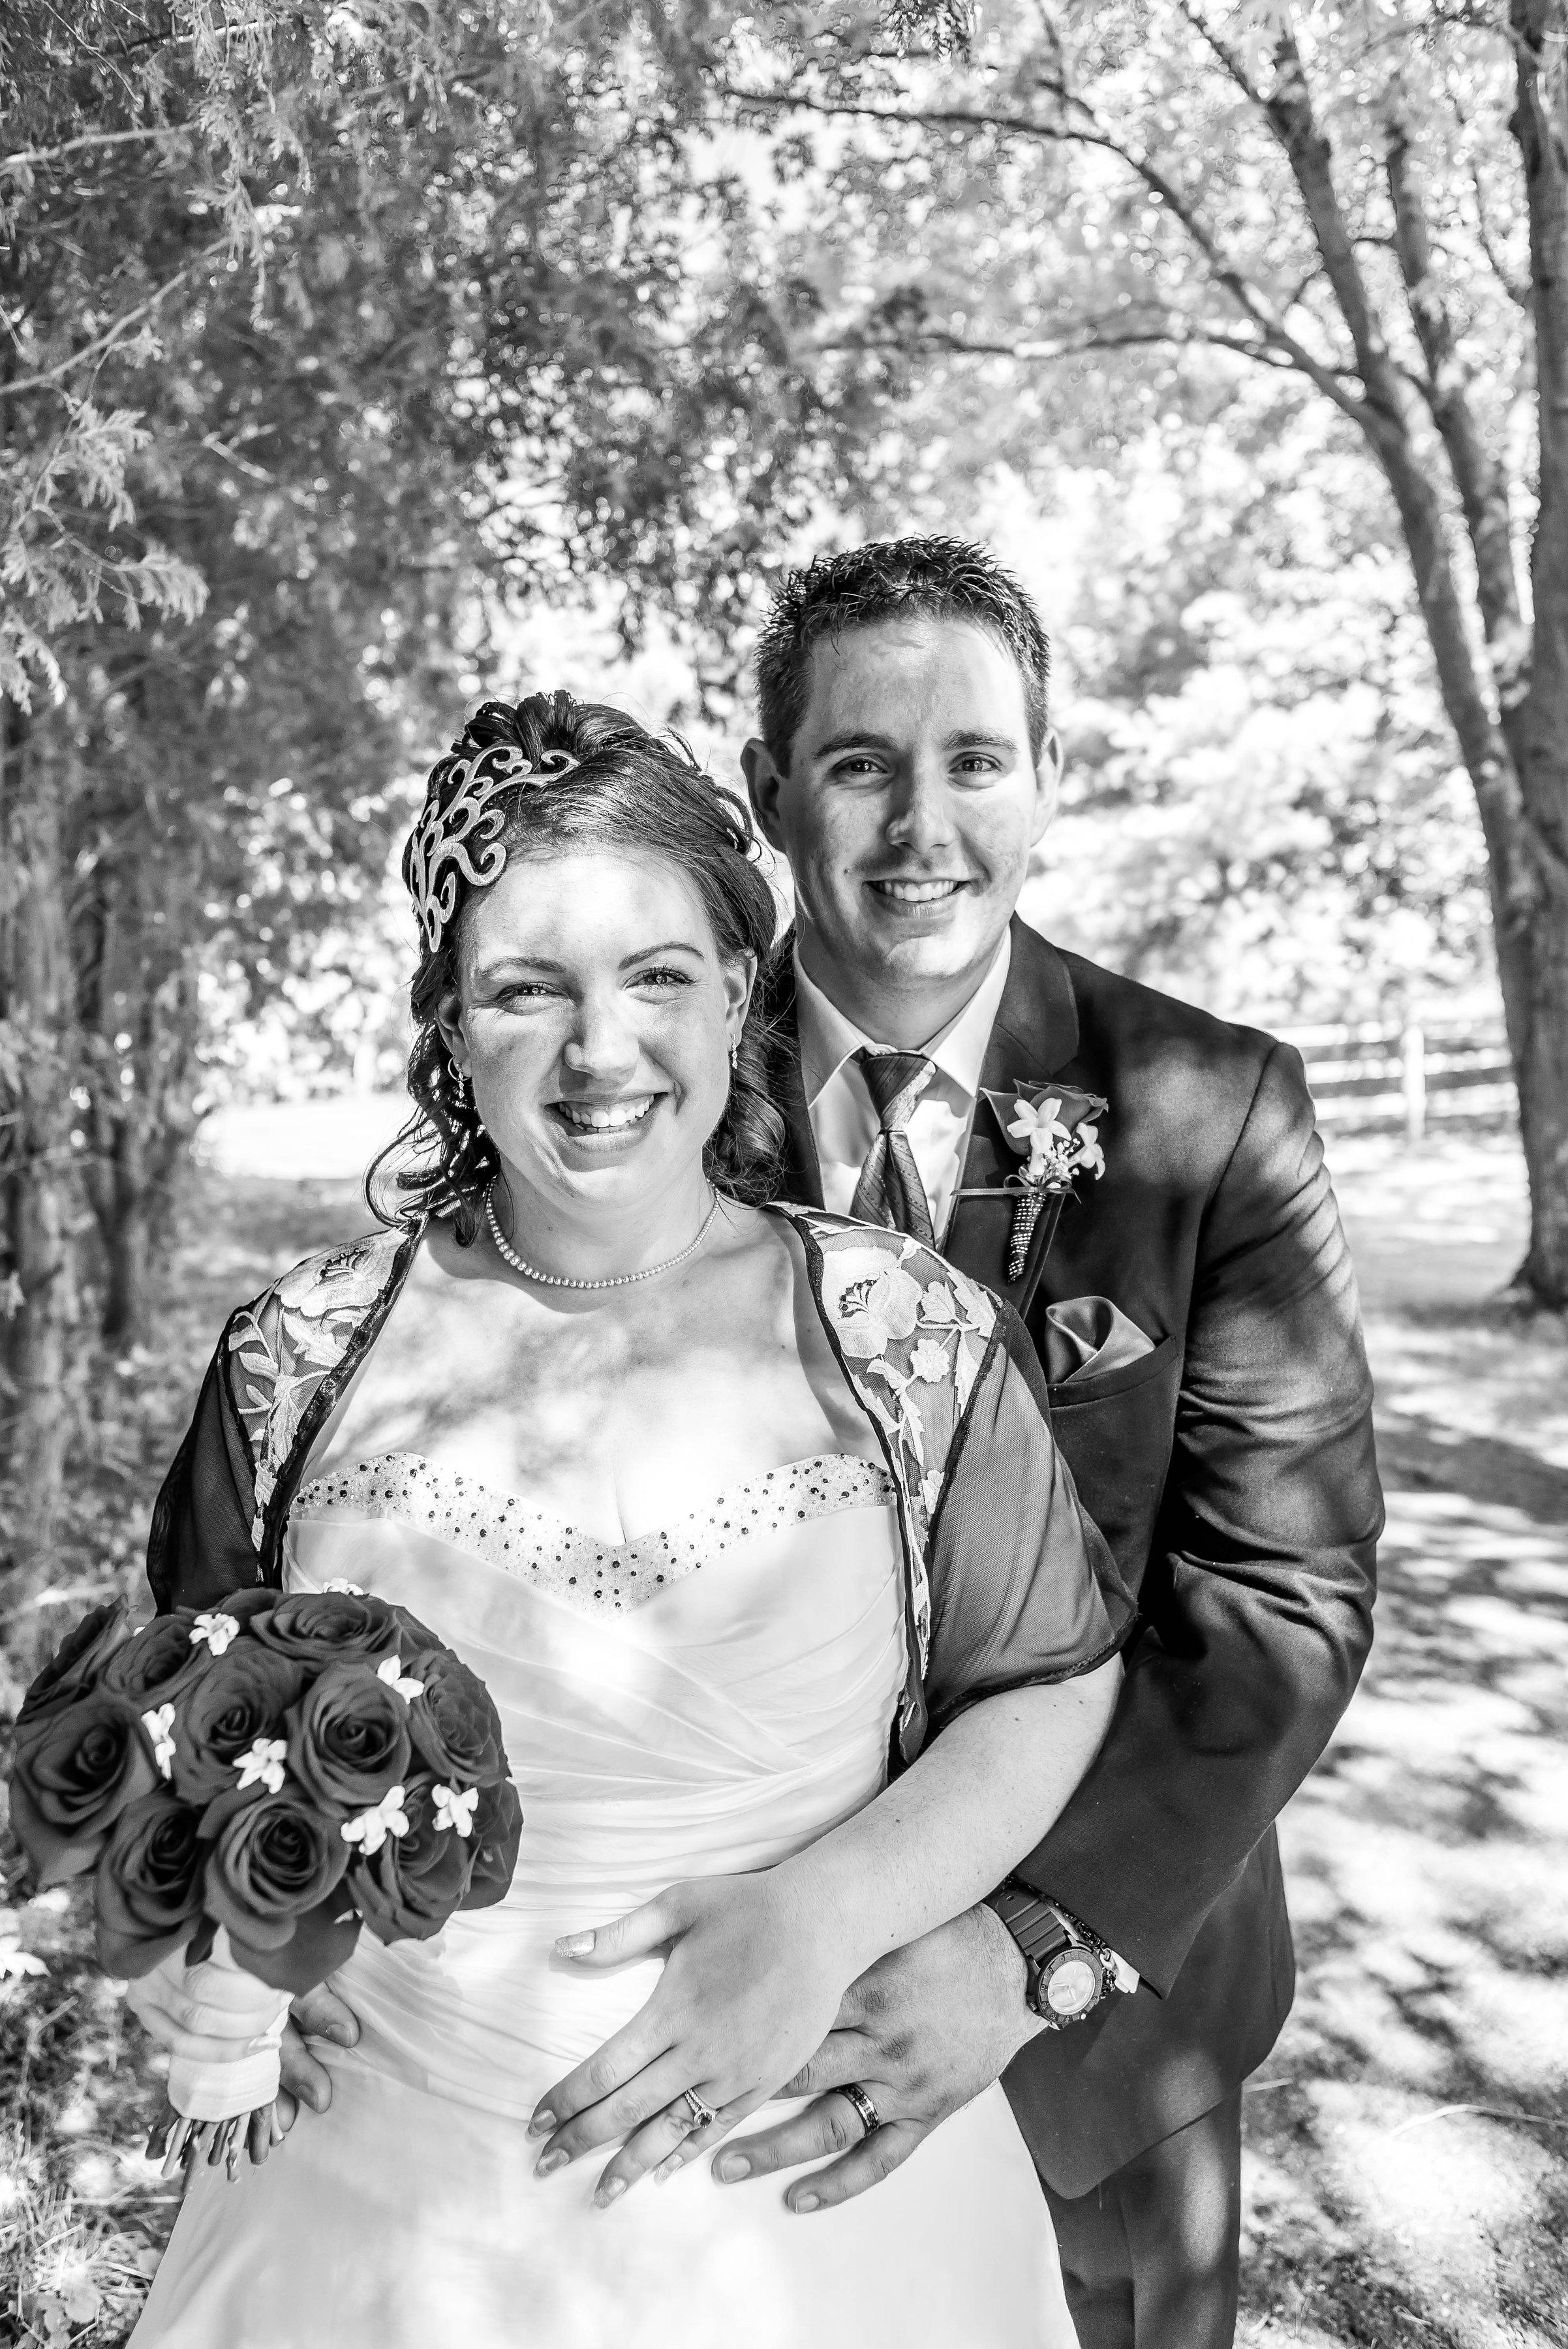 J&T-wedding-1019-2.jpg